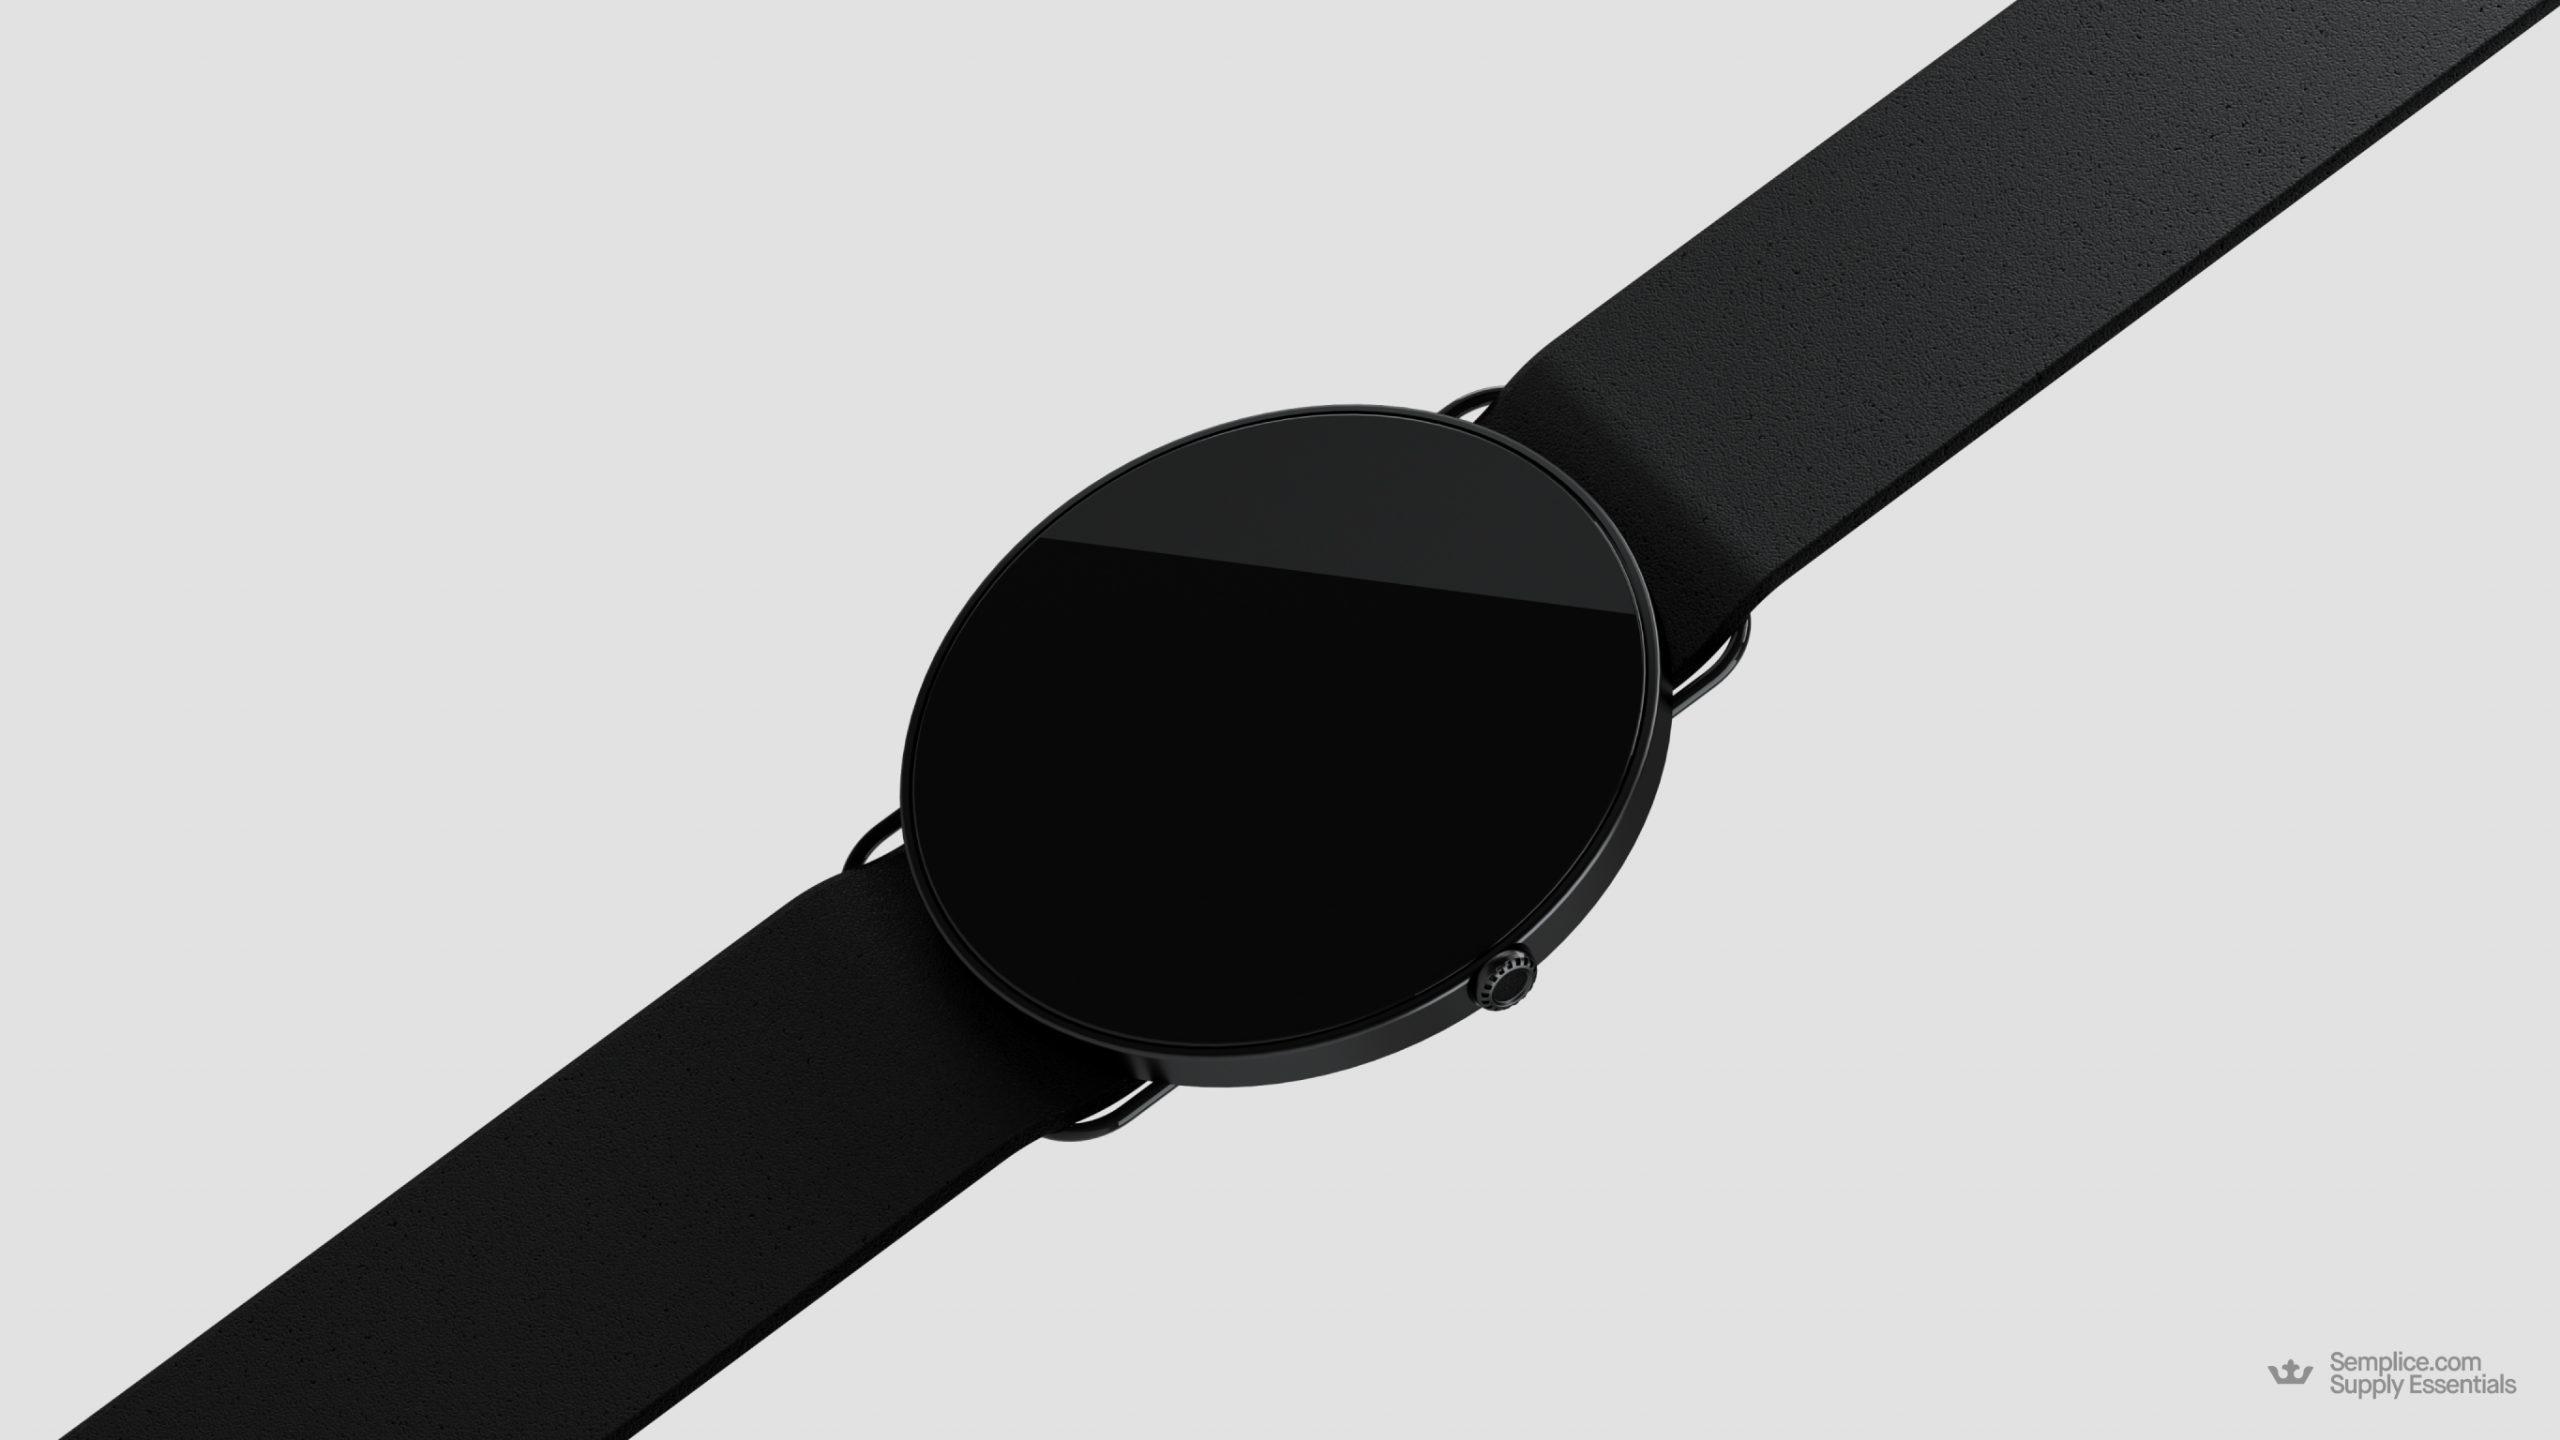 smartwatch-supply-store-bg